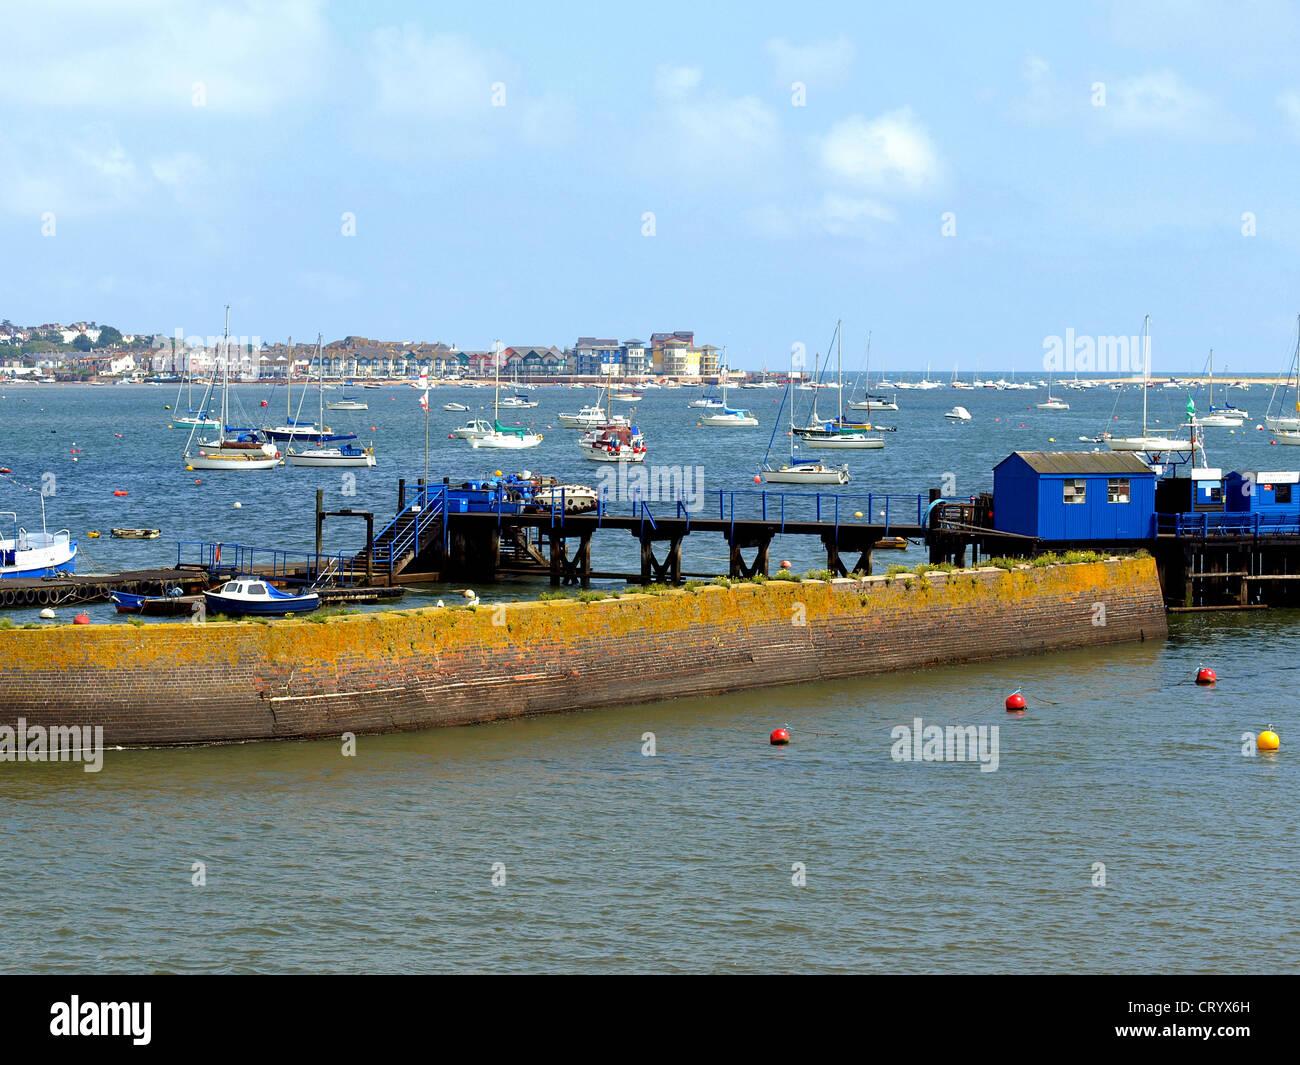 Ferry landing at Starcross, Devon. - Stock Image